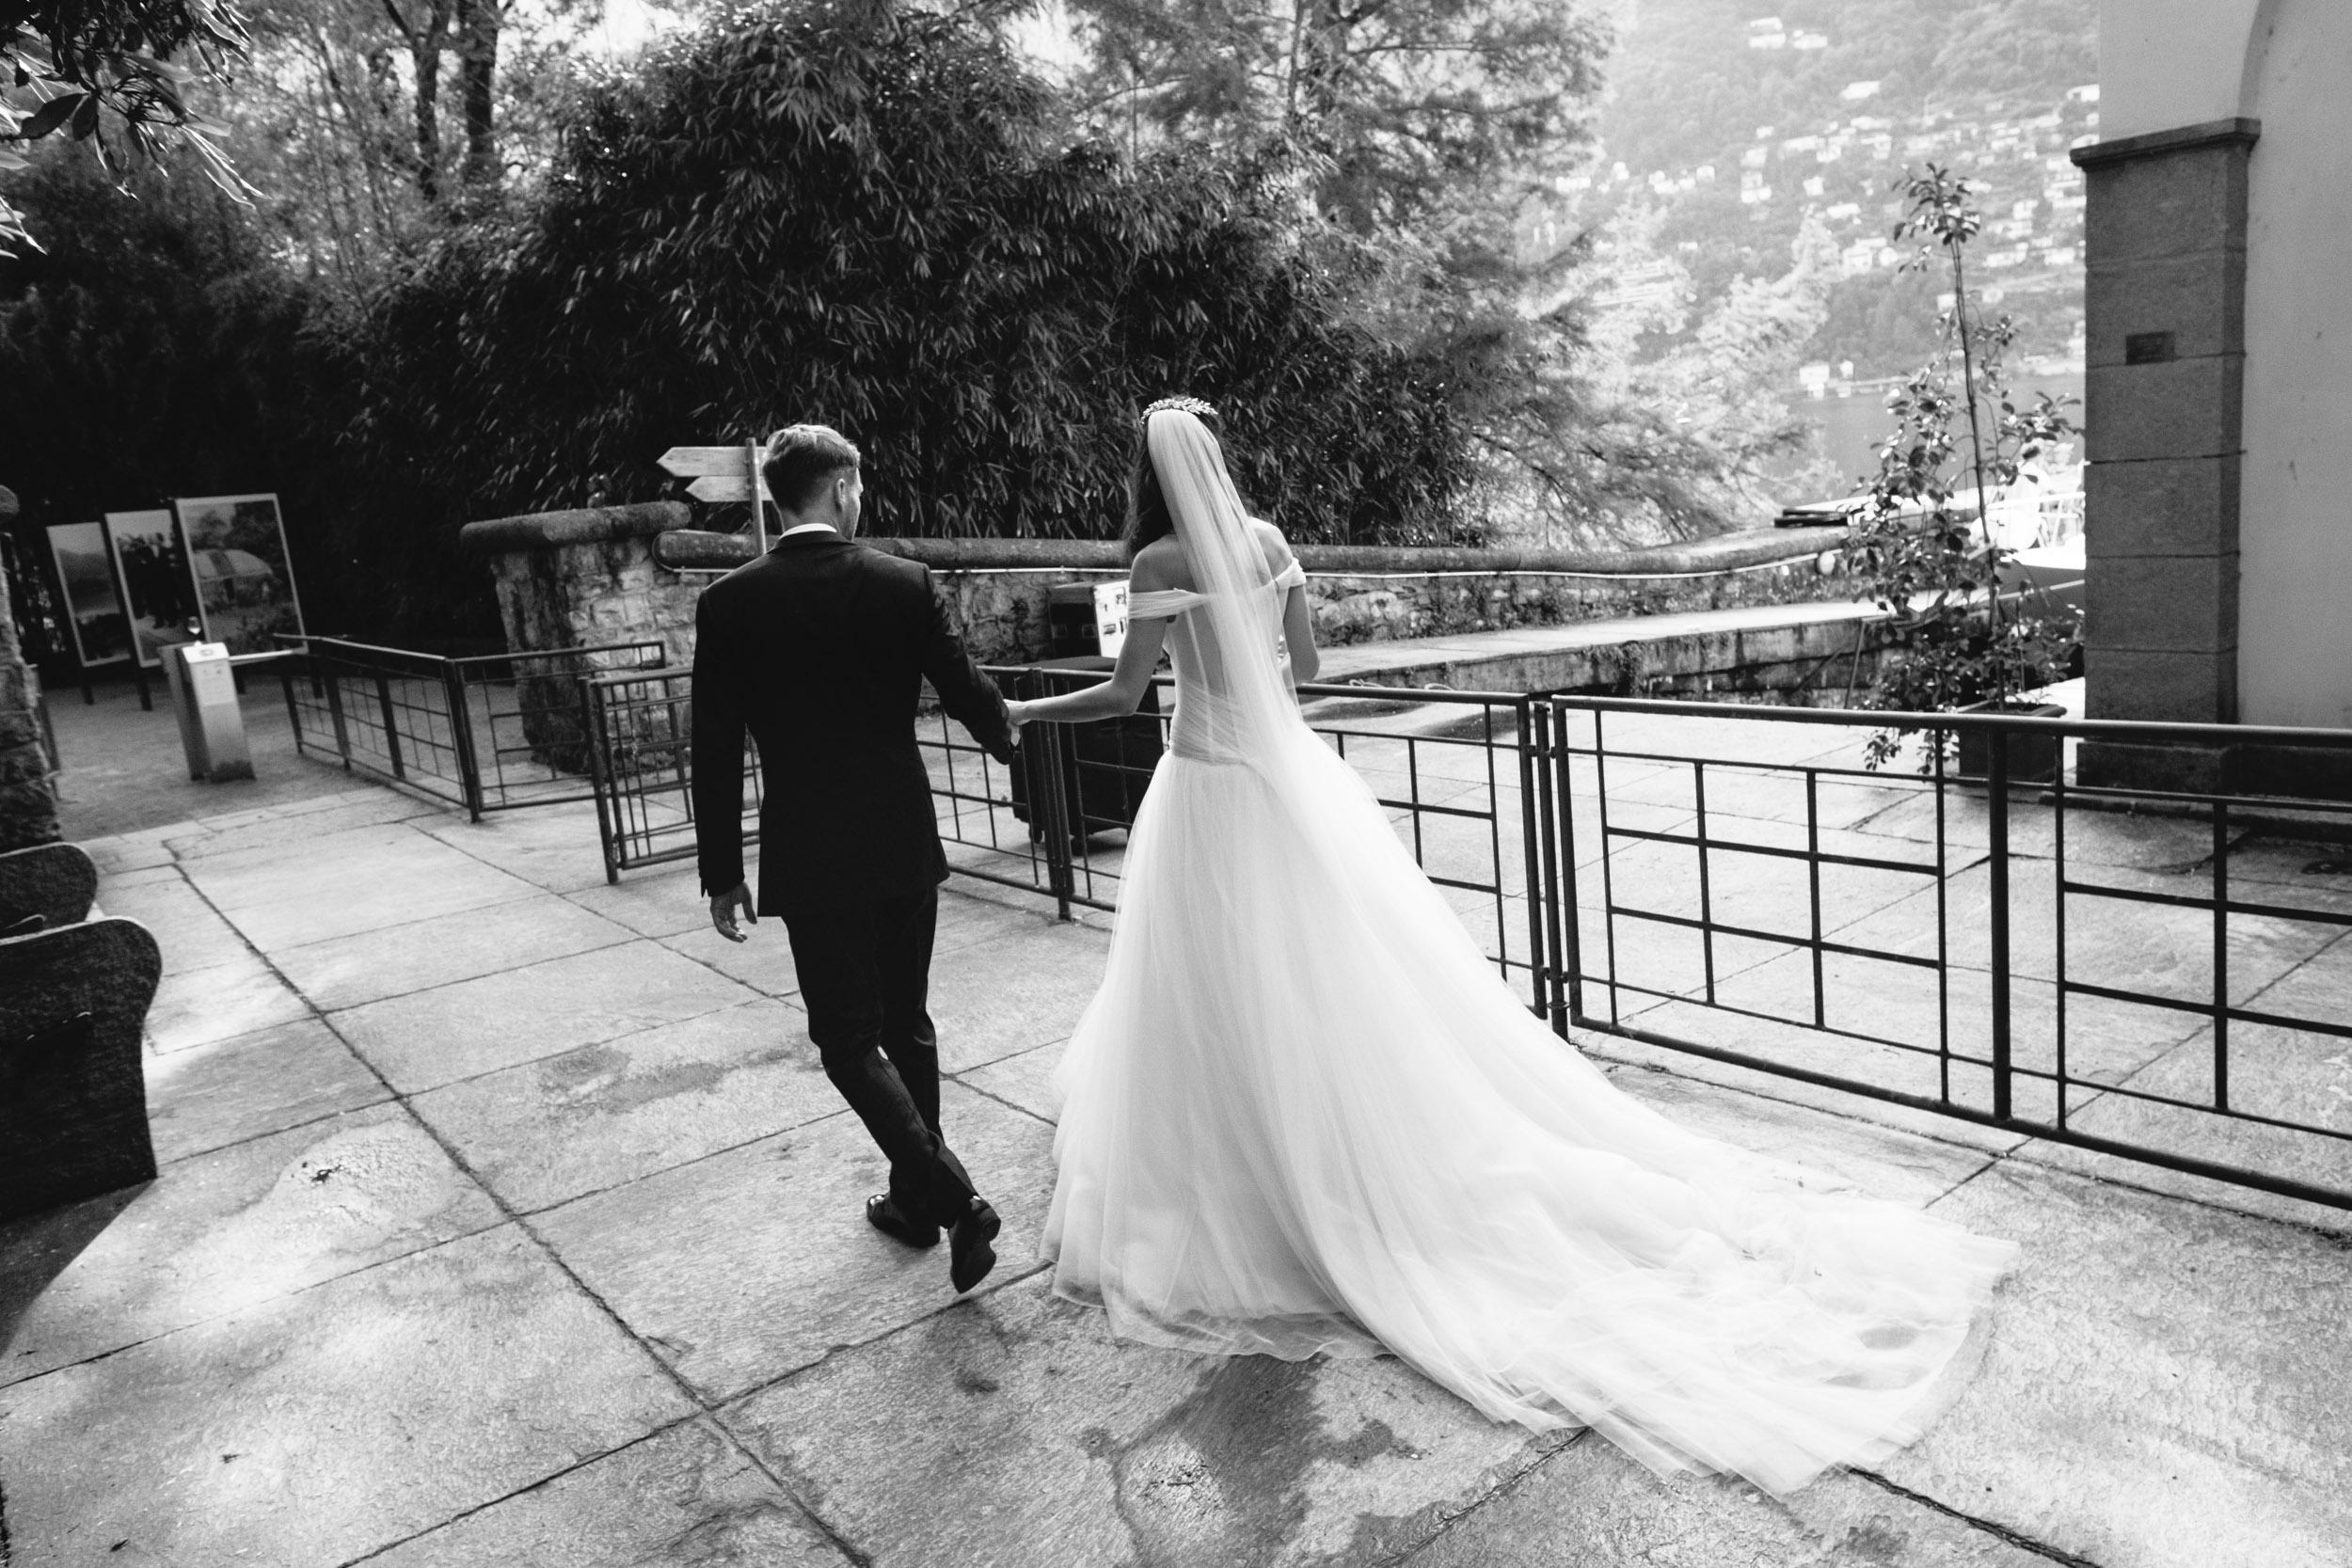 olivia-andreas-wedding-switzerland-412.jpg